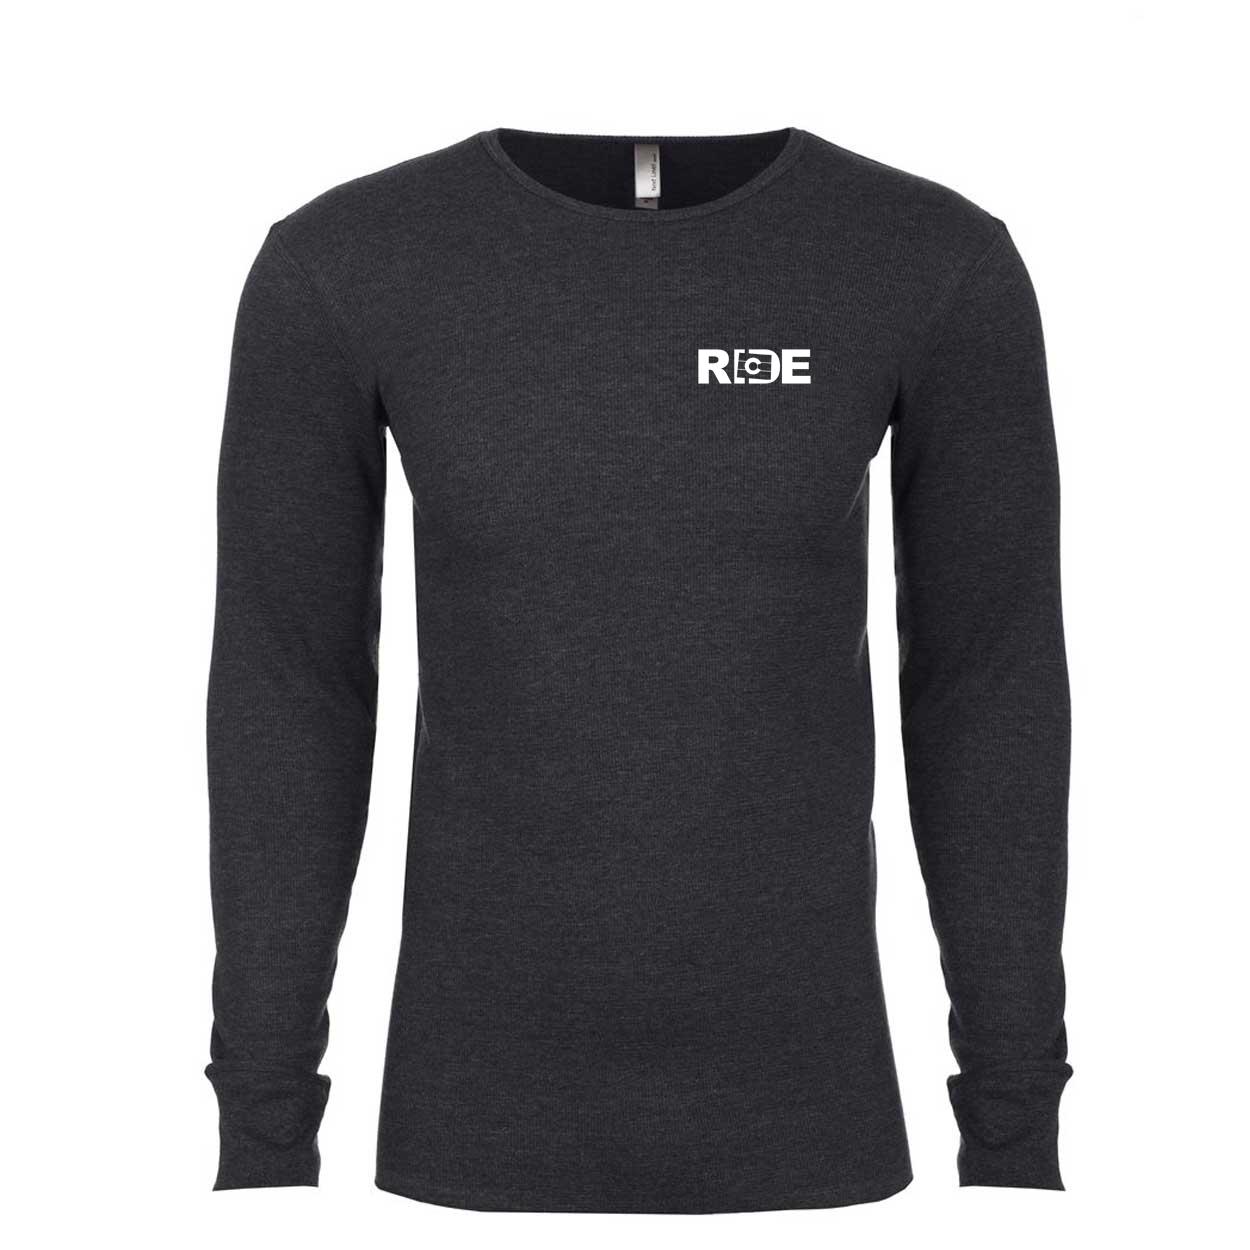 Ride Colorado Long Sleeve Thermal Shirt Heather Charcoal (White Logo)